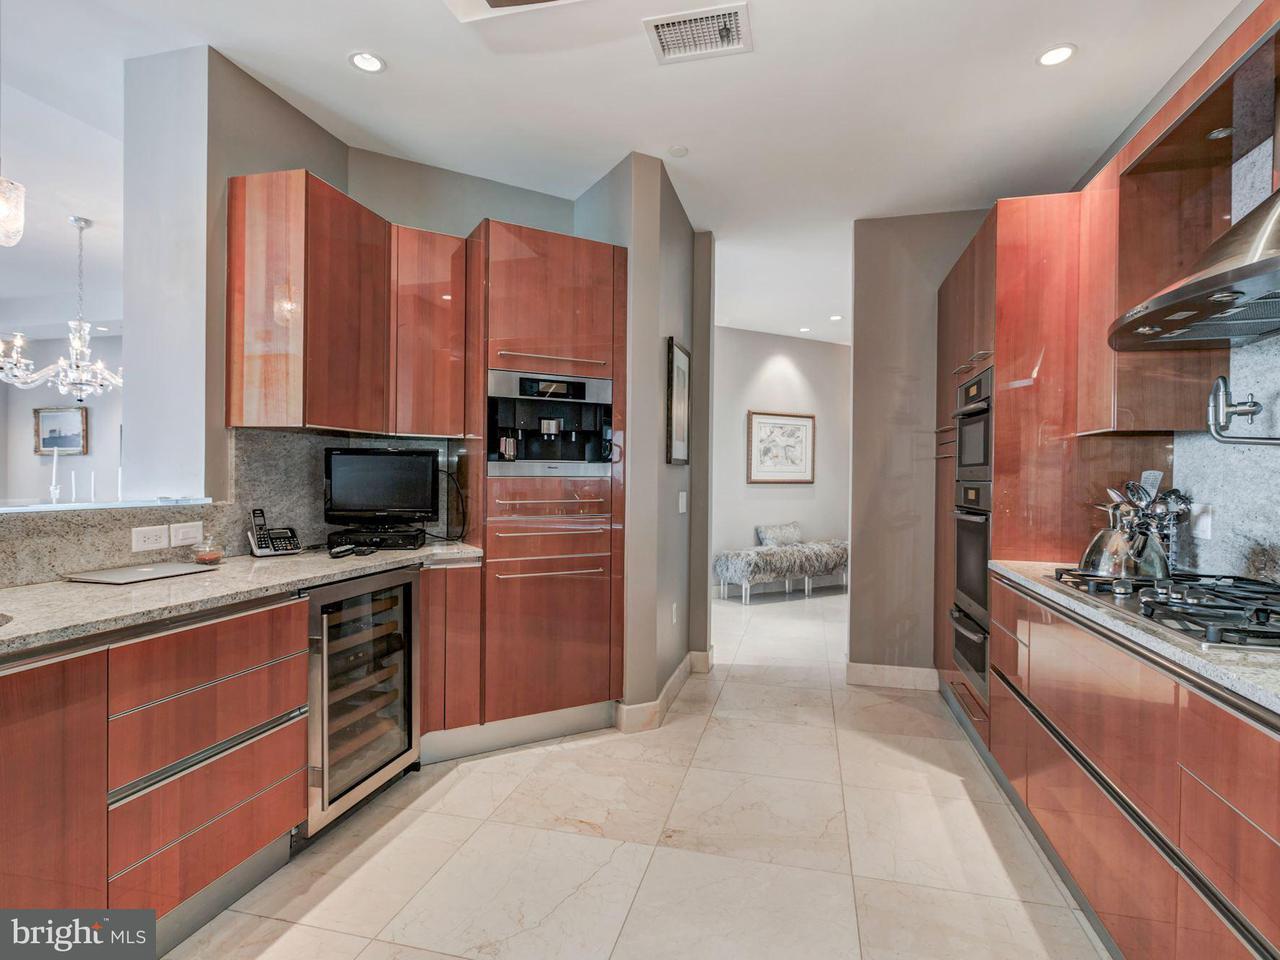 Additional photo for property listing at 1881 Nash St N #2102 1881 Nash St N #2102 Arlington, Virginia 22209 United States